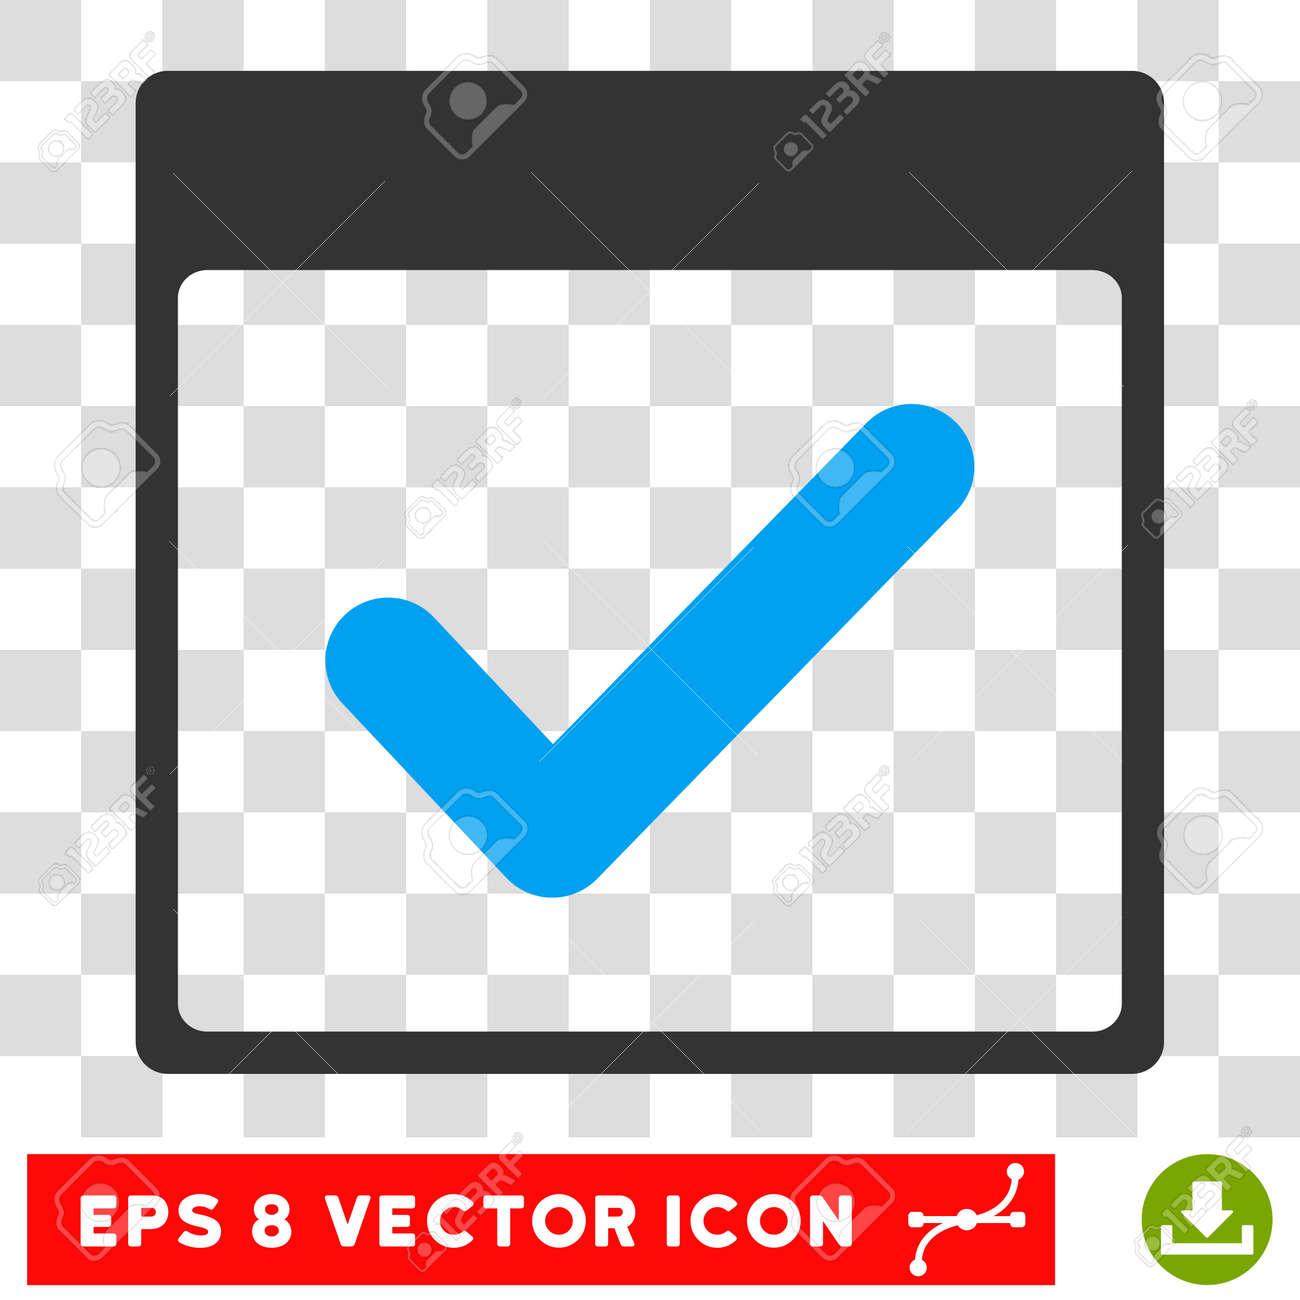 Vector Valid Day Calendar Page EPS Vector Pictogram Illustration